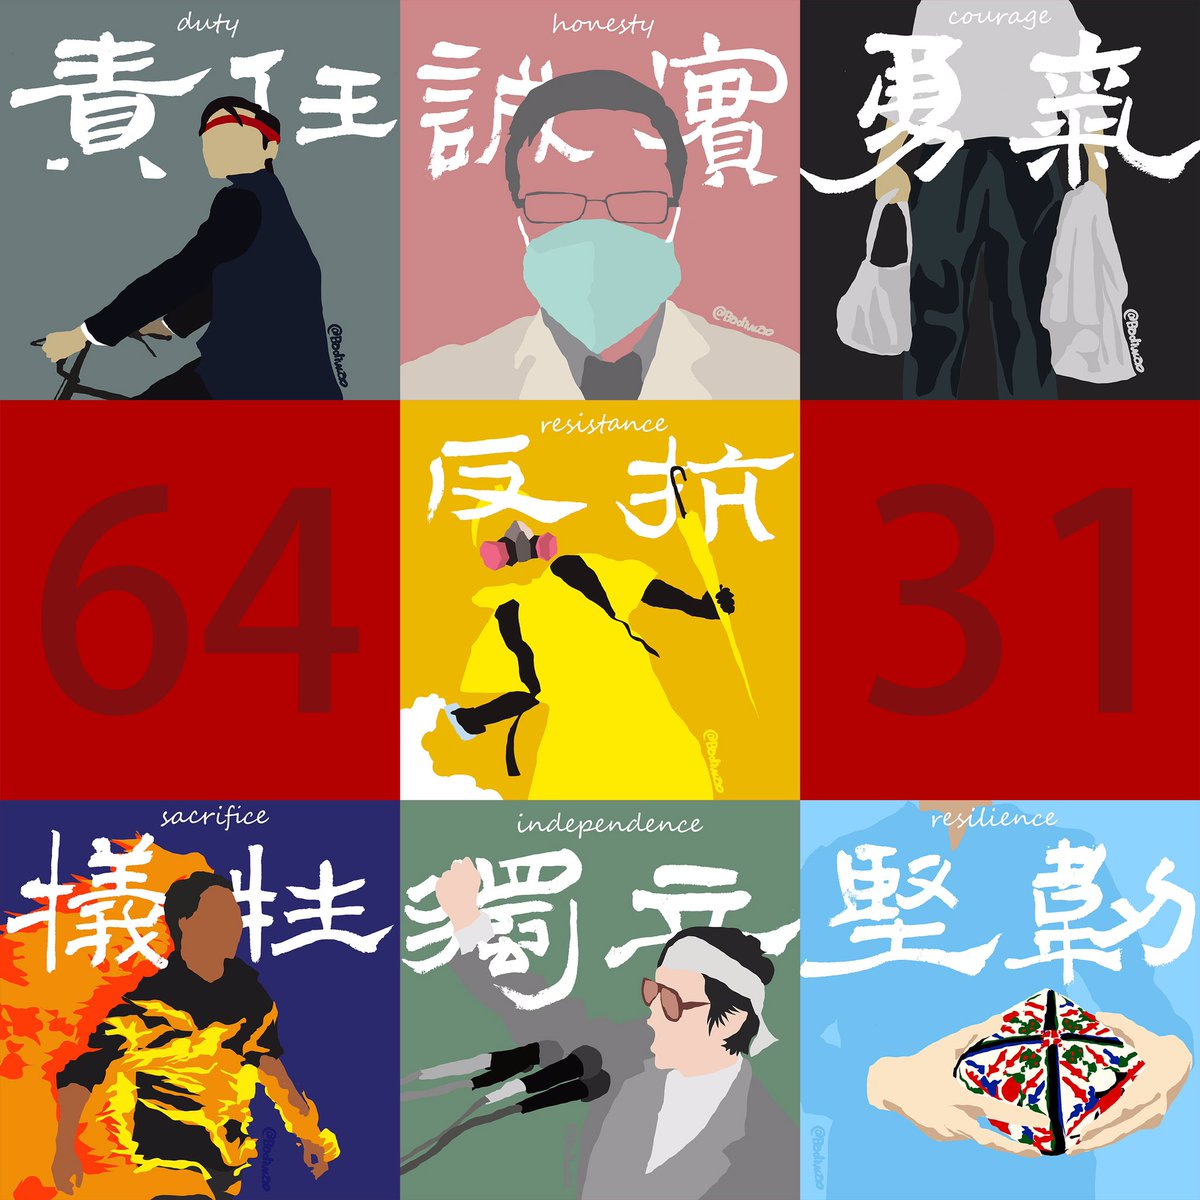 Today is the 31th of the anniversary for #TiananmenSquareMassacre  Call for Australian politicians to stand with human rights for Australia's China, Hongkong,Taiwan, Uyghur and Tibet community!  @ScottMorrisonMP @MarisePayne @SenatorWong @AdamBandt  @MrKRudd   #auspol https://t.co/BihQ0hJJDi